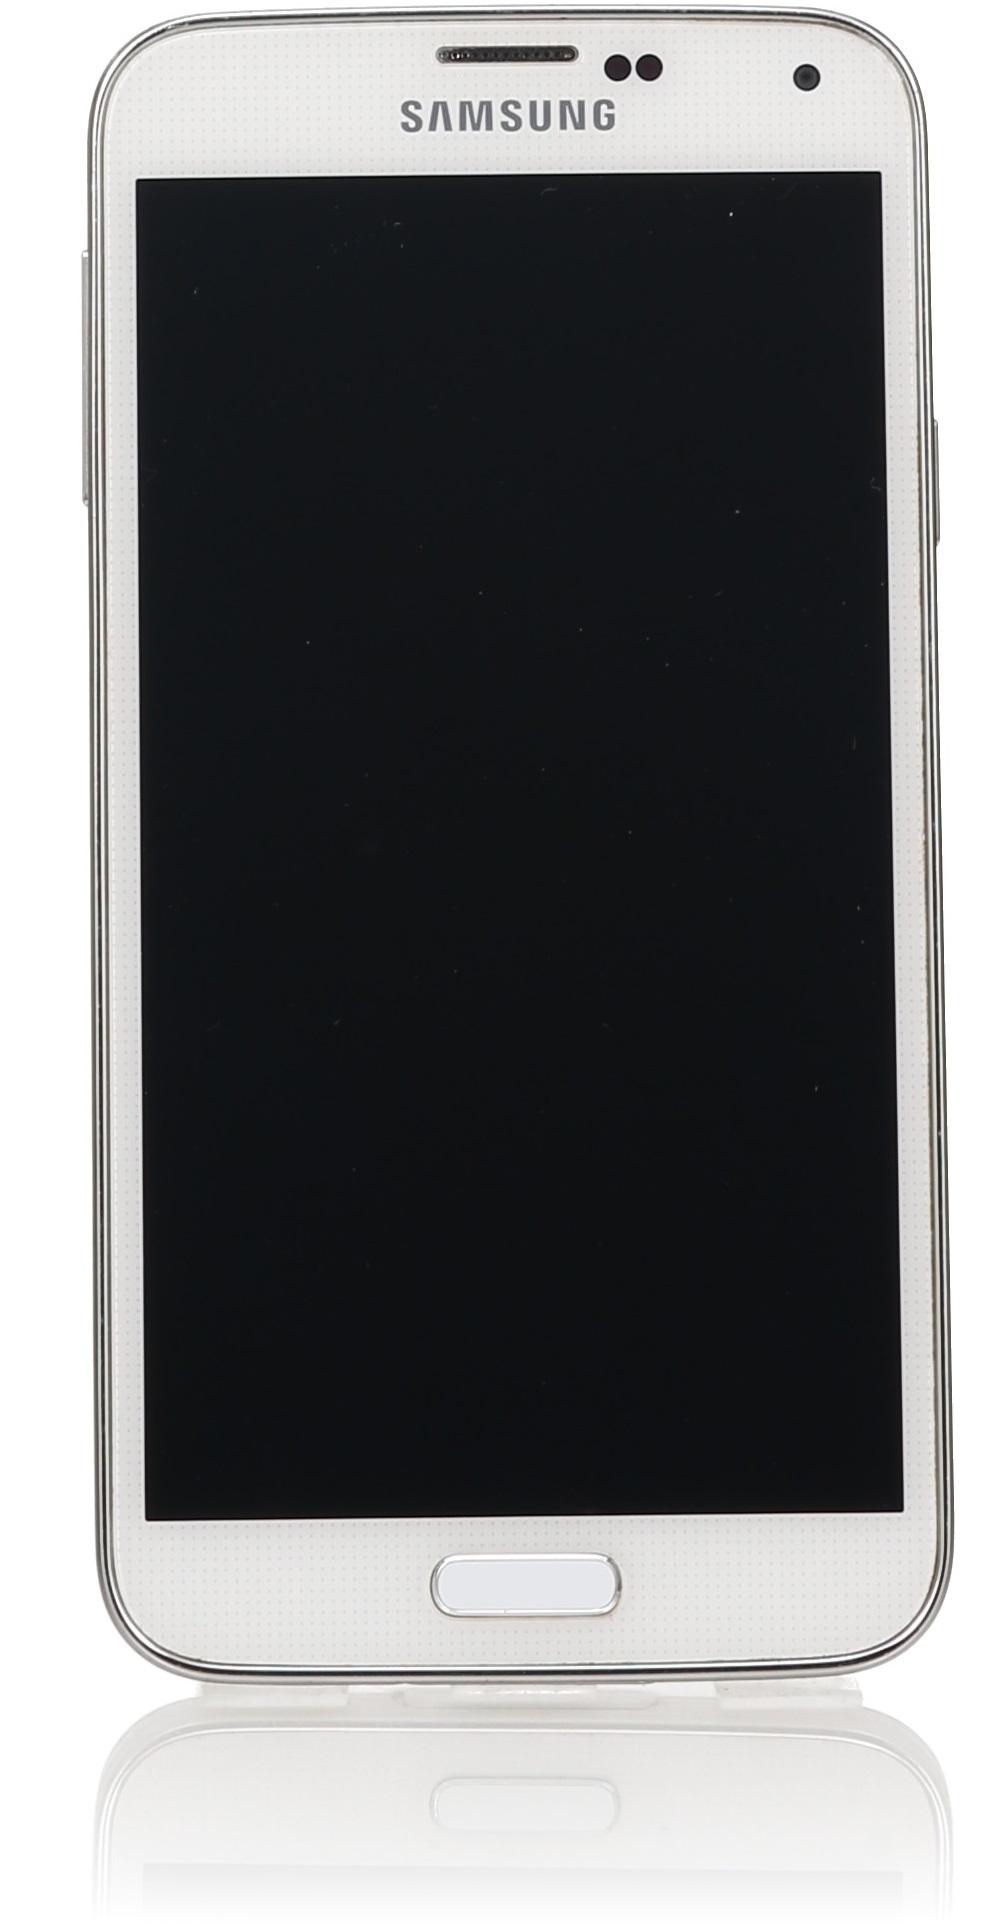 Samsung G900F Galaxy S5 16GB shimmery white